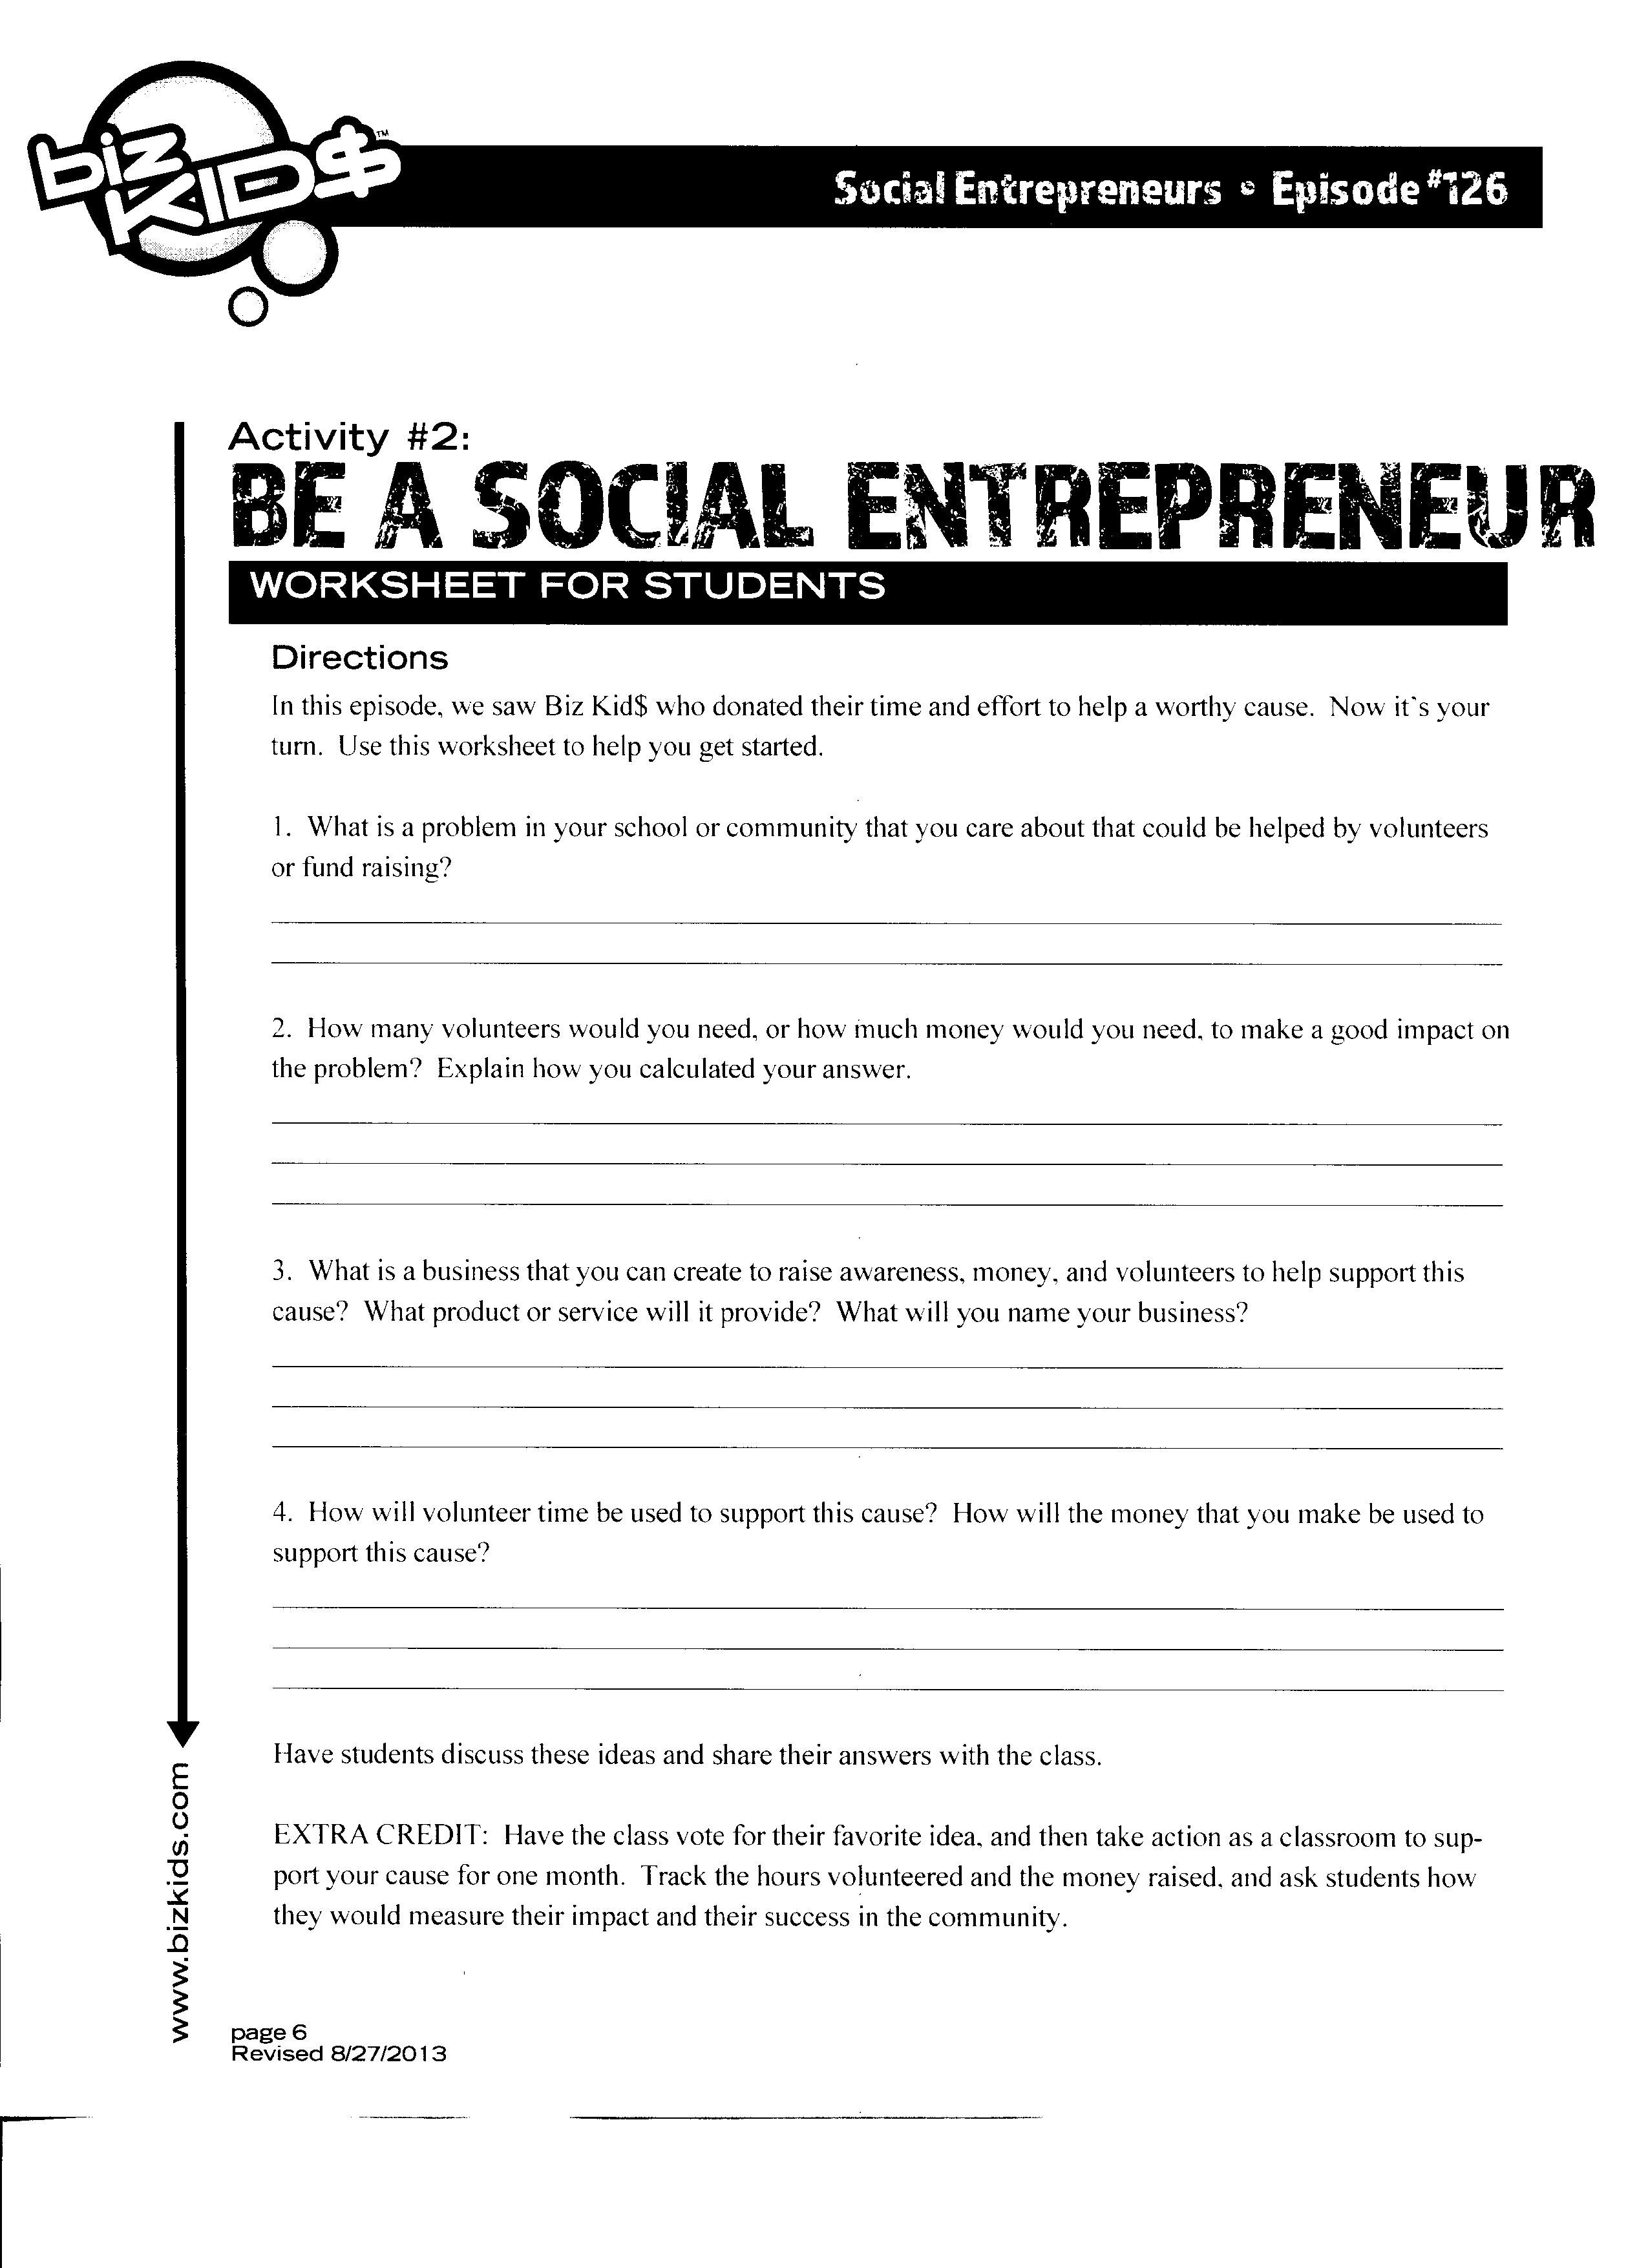 entrepreneurship worksheets high school entrepreneurship best free printable worksheets. Black Bedroom Furniture Sets. Home Design Ideas